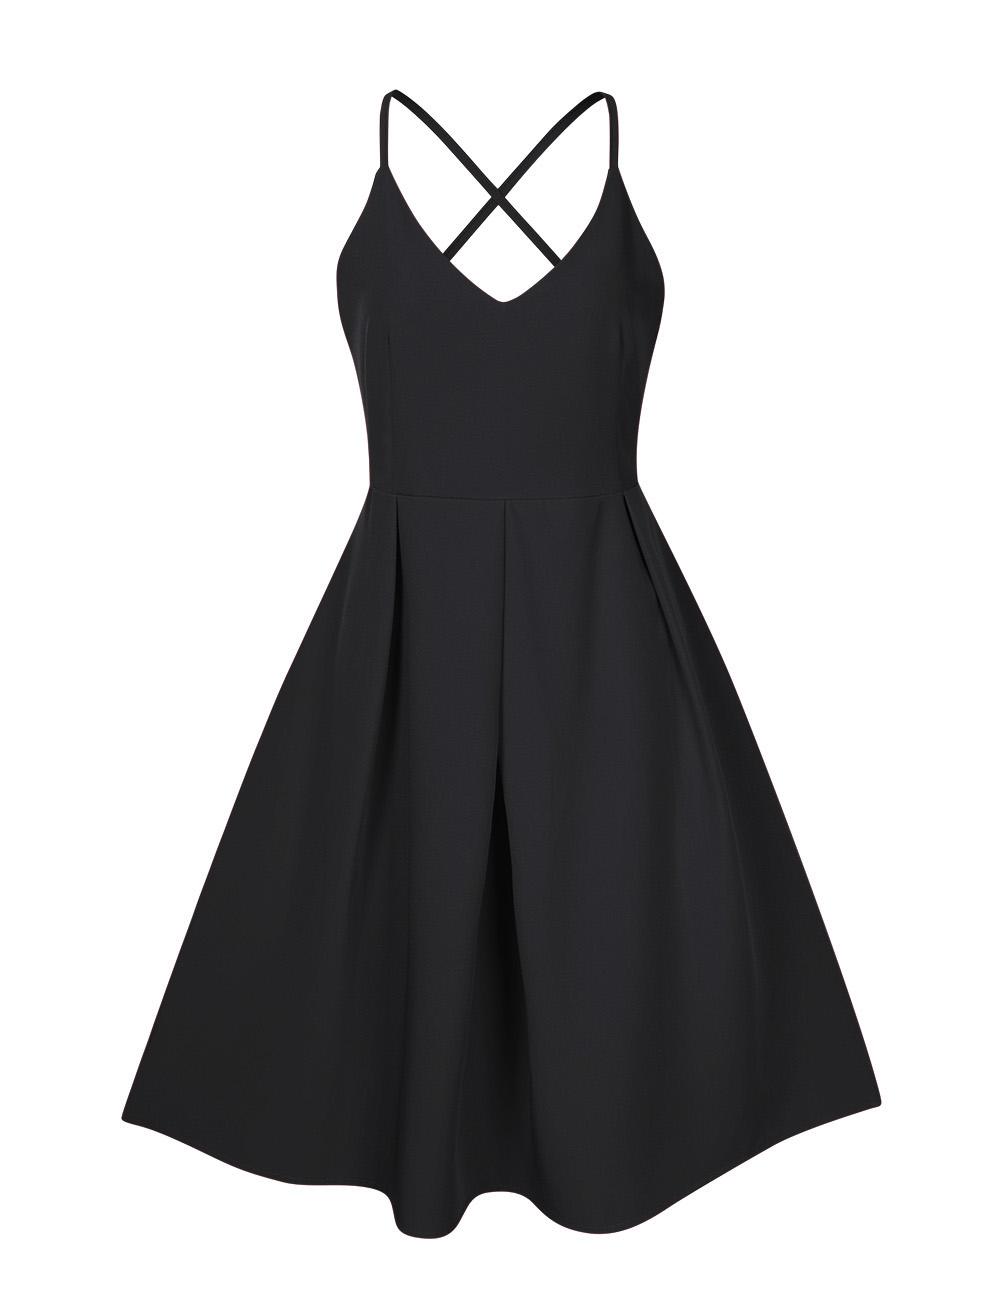 GlorySunshine Women Deep V-Neck Spaghetti Strap Dress Sleeveless Sexy Summer Cocktail Party Dresses Black_S